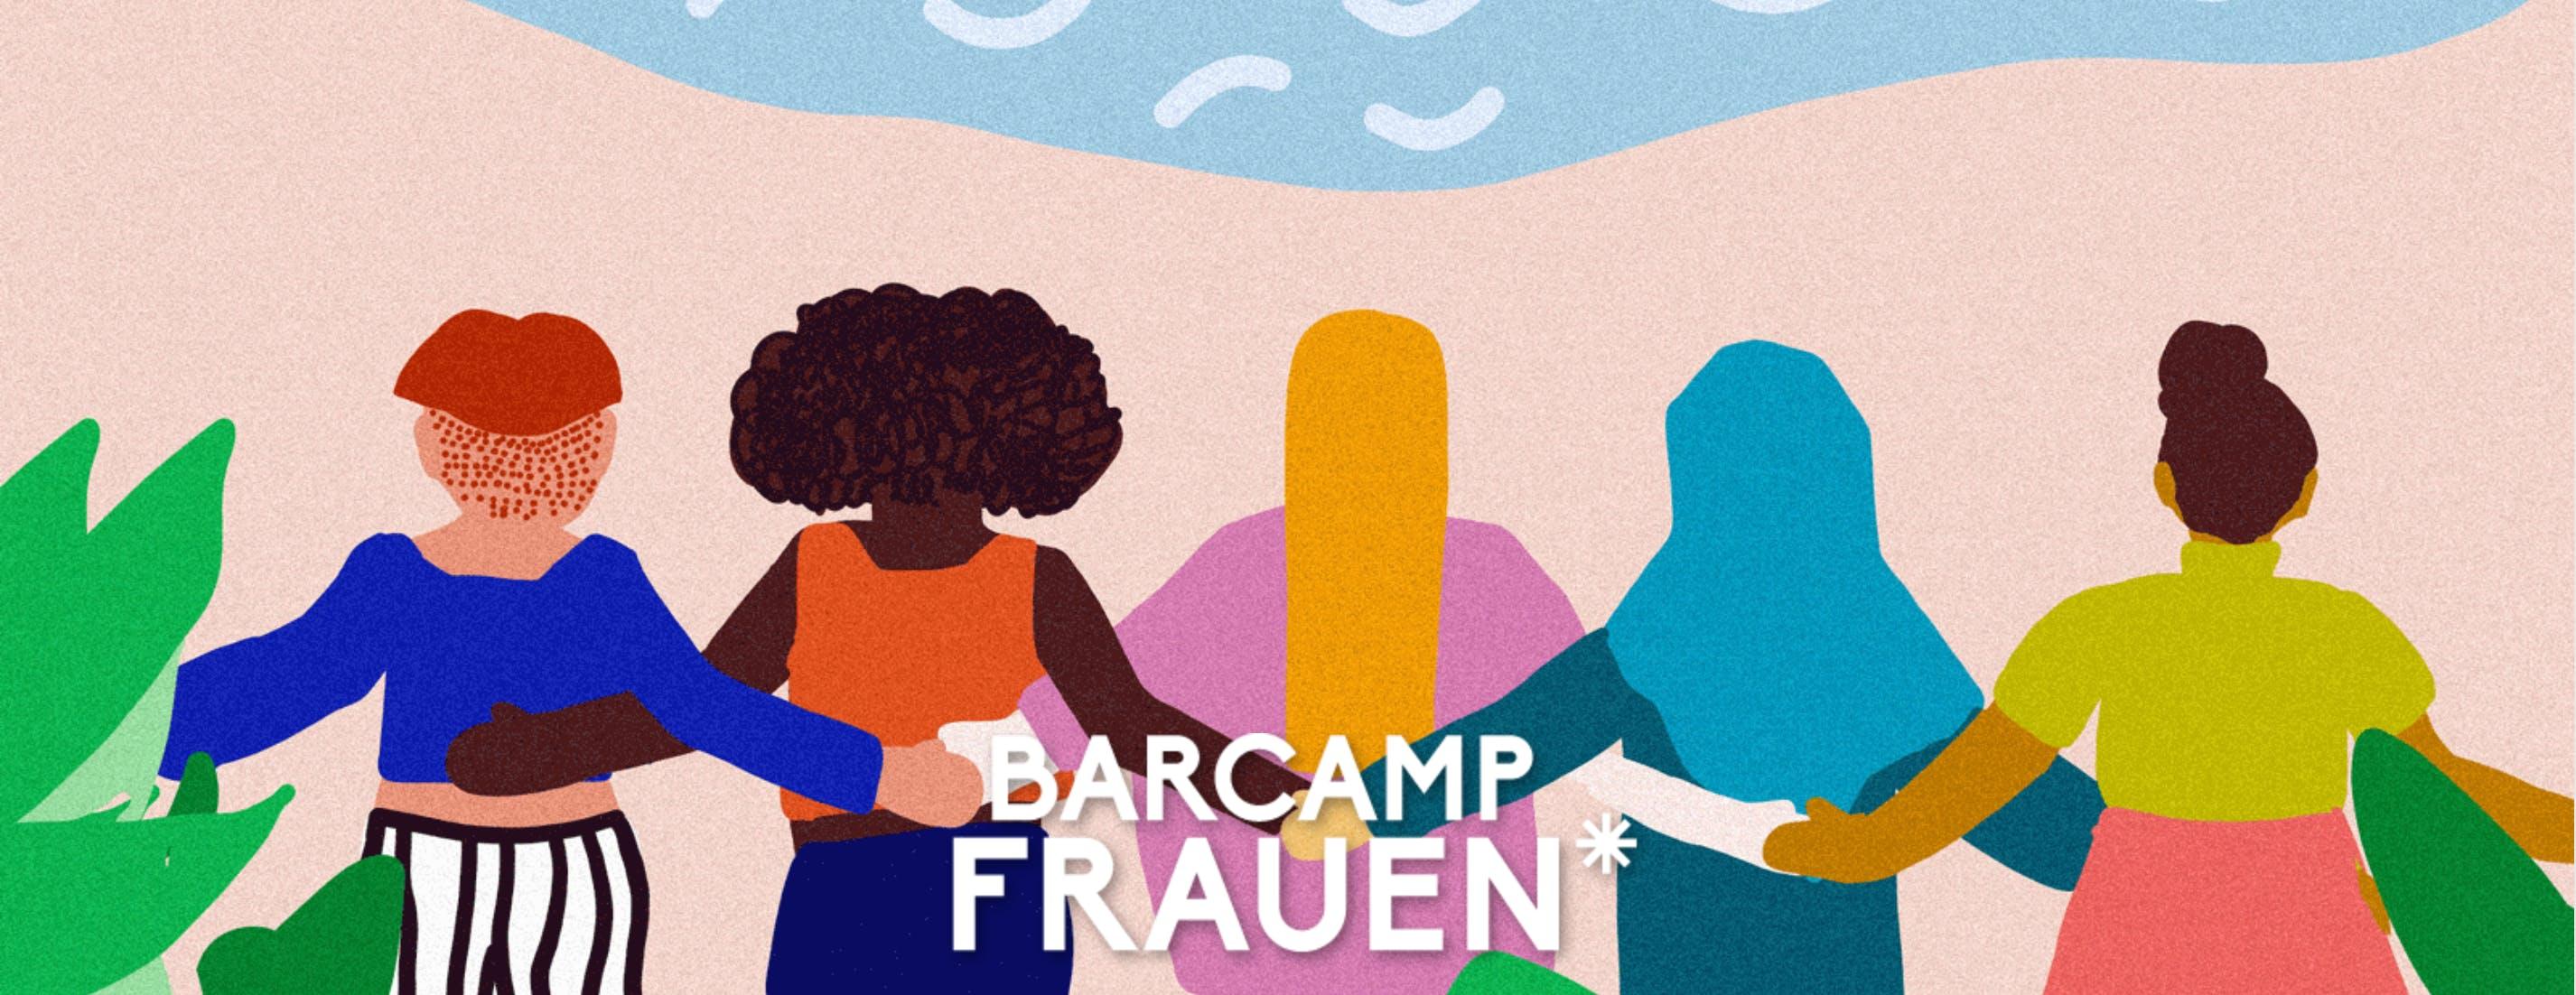 Frauen* Barcamp